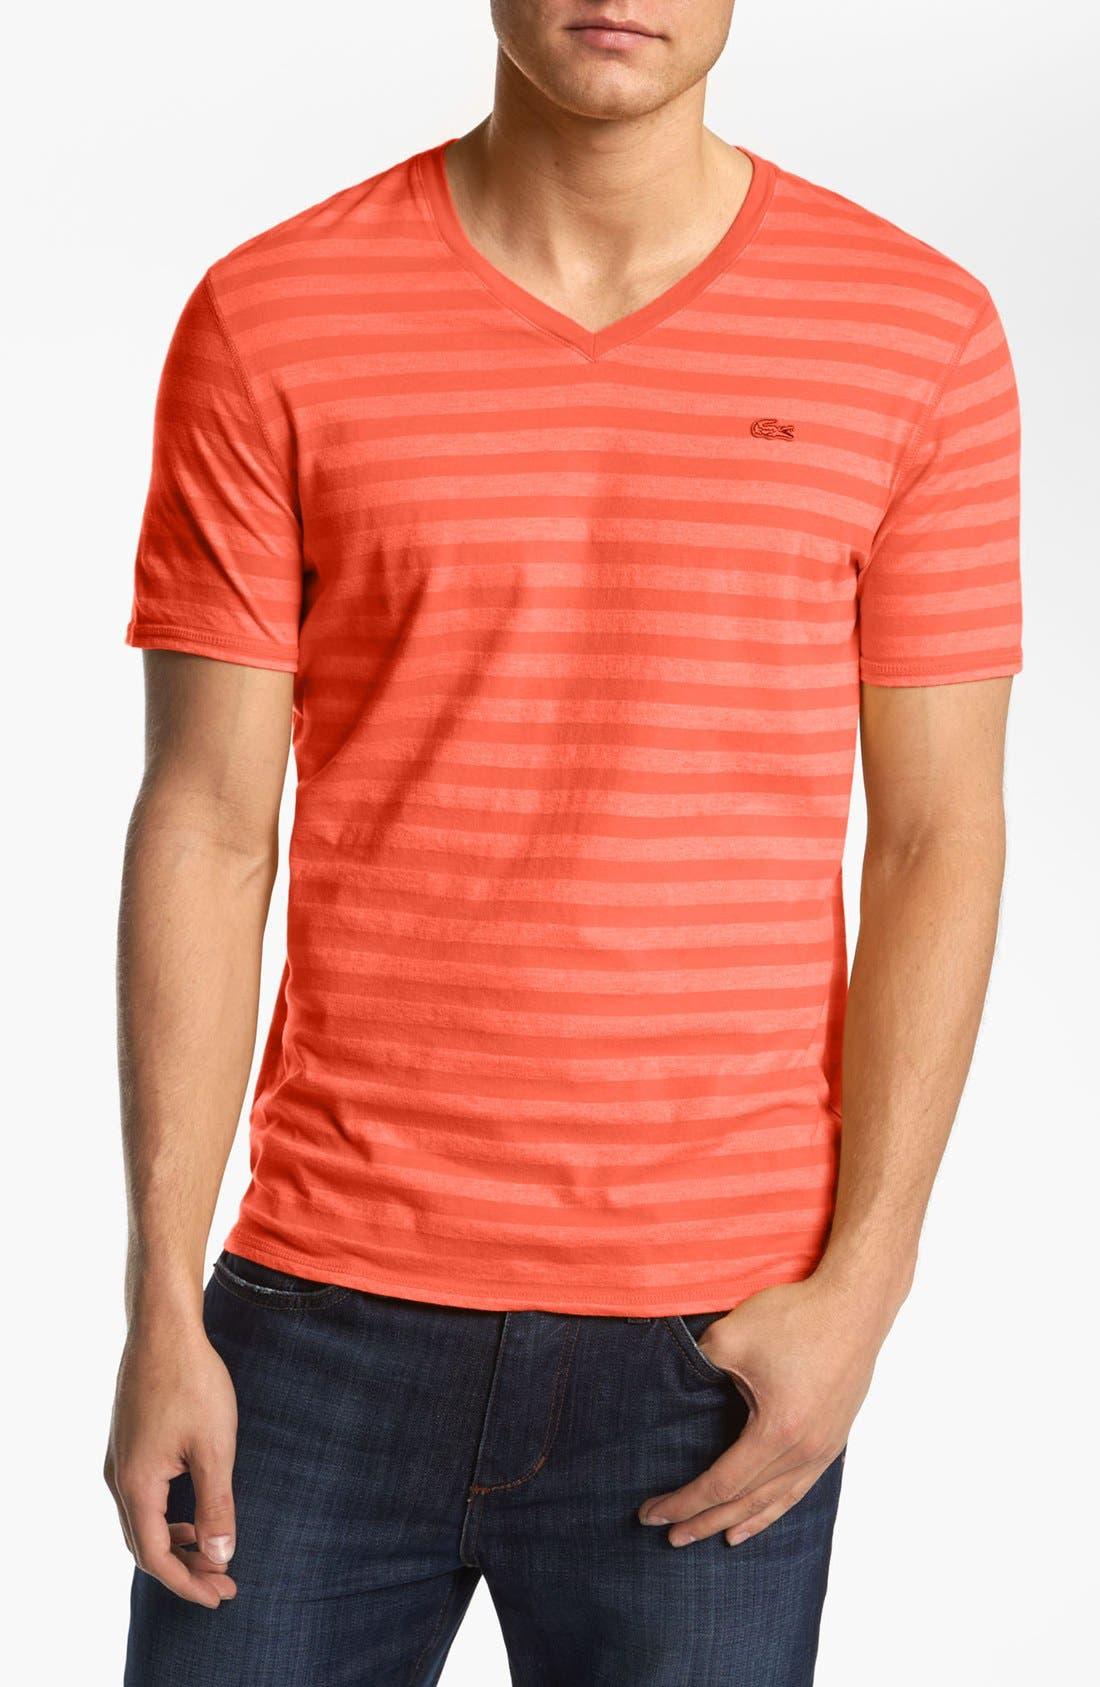 Main Image - Lacoste Stripe V-Neck T-Shirt